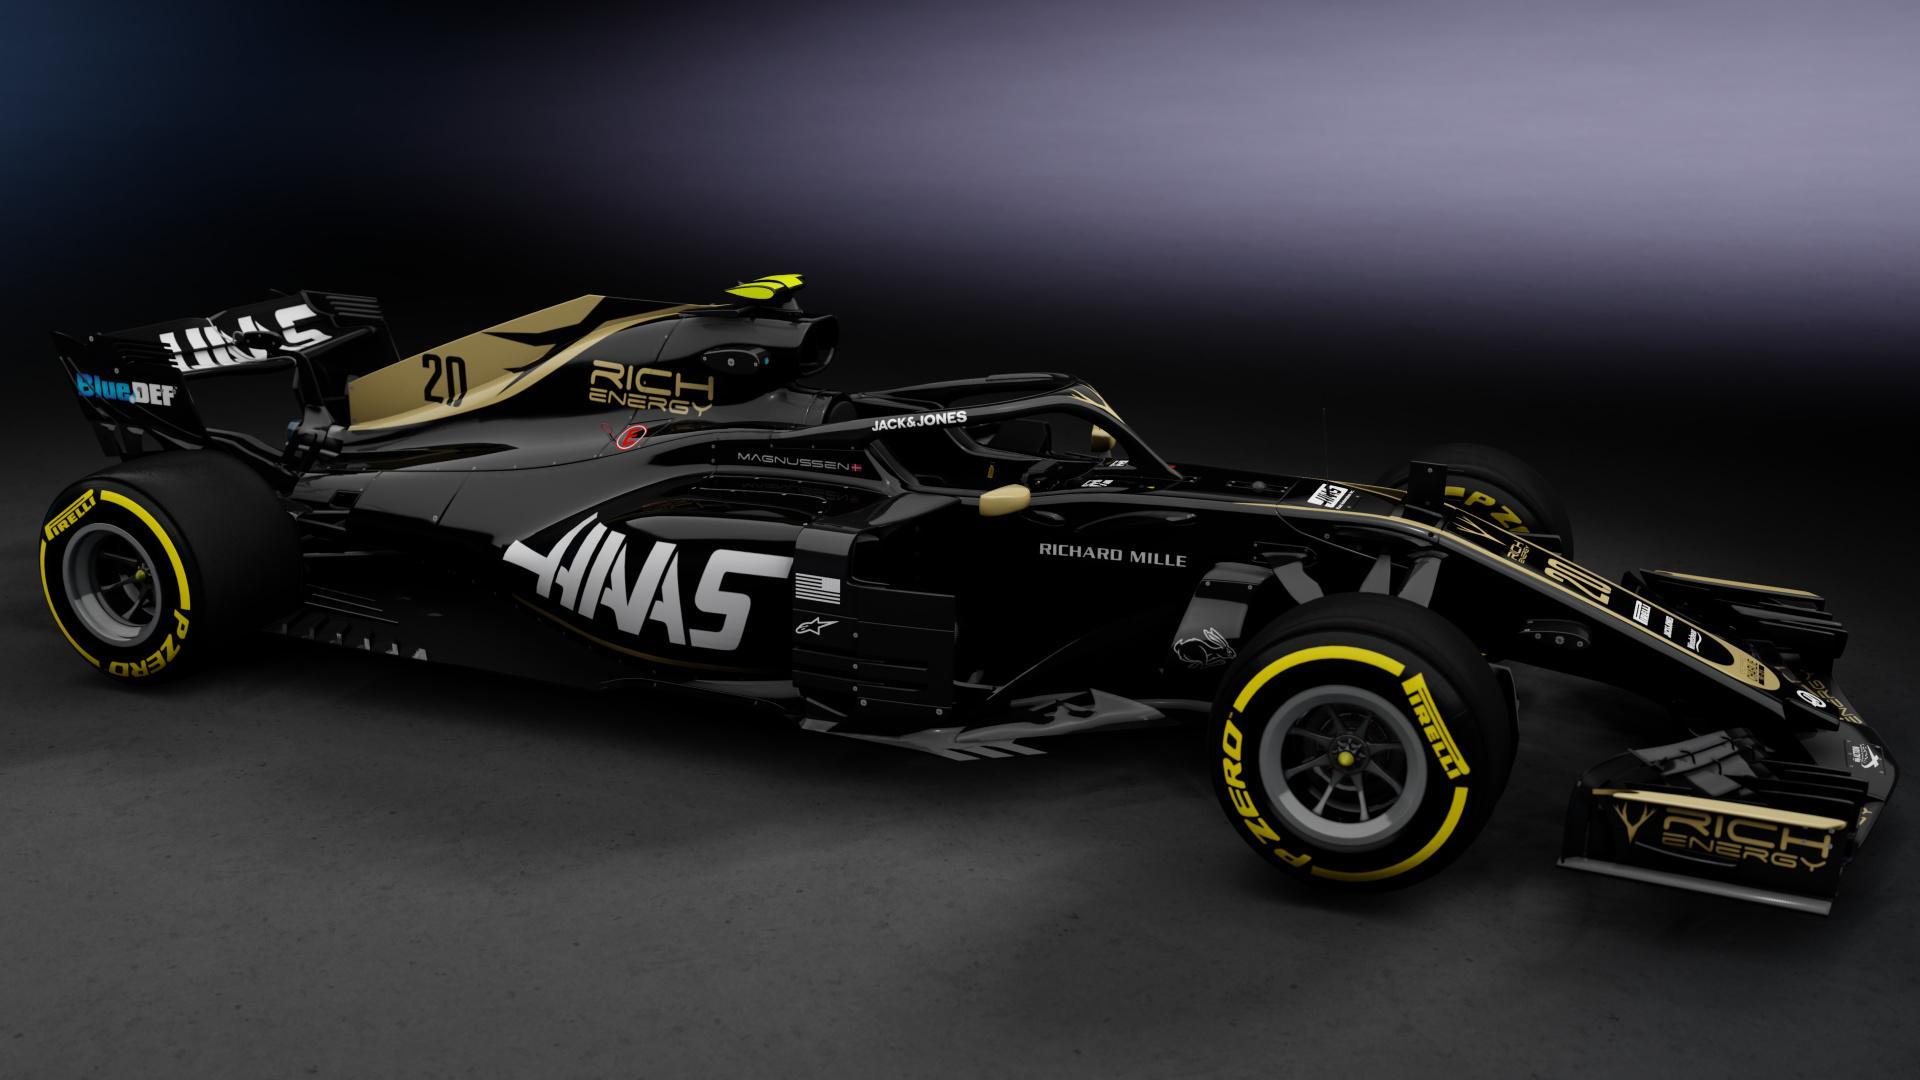 Haas F1 Teams Background 6